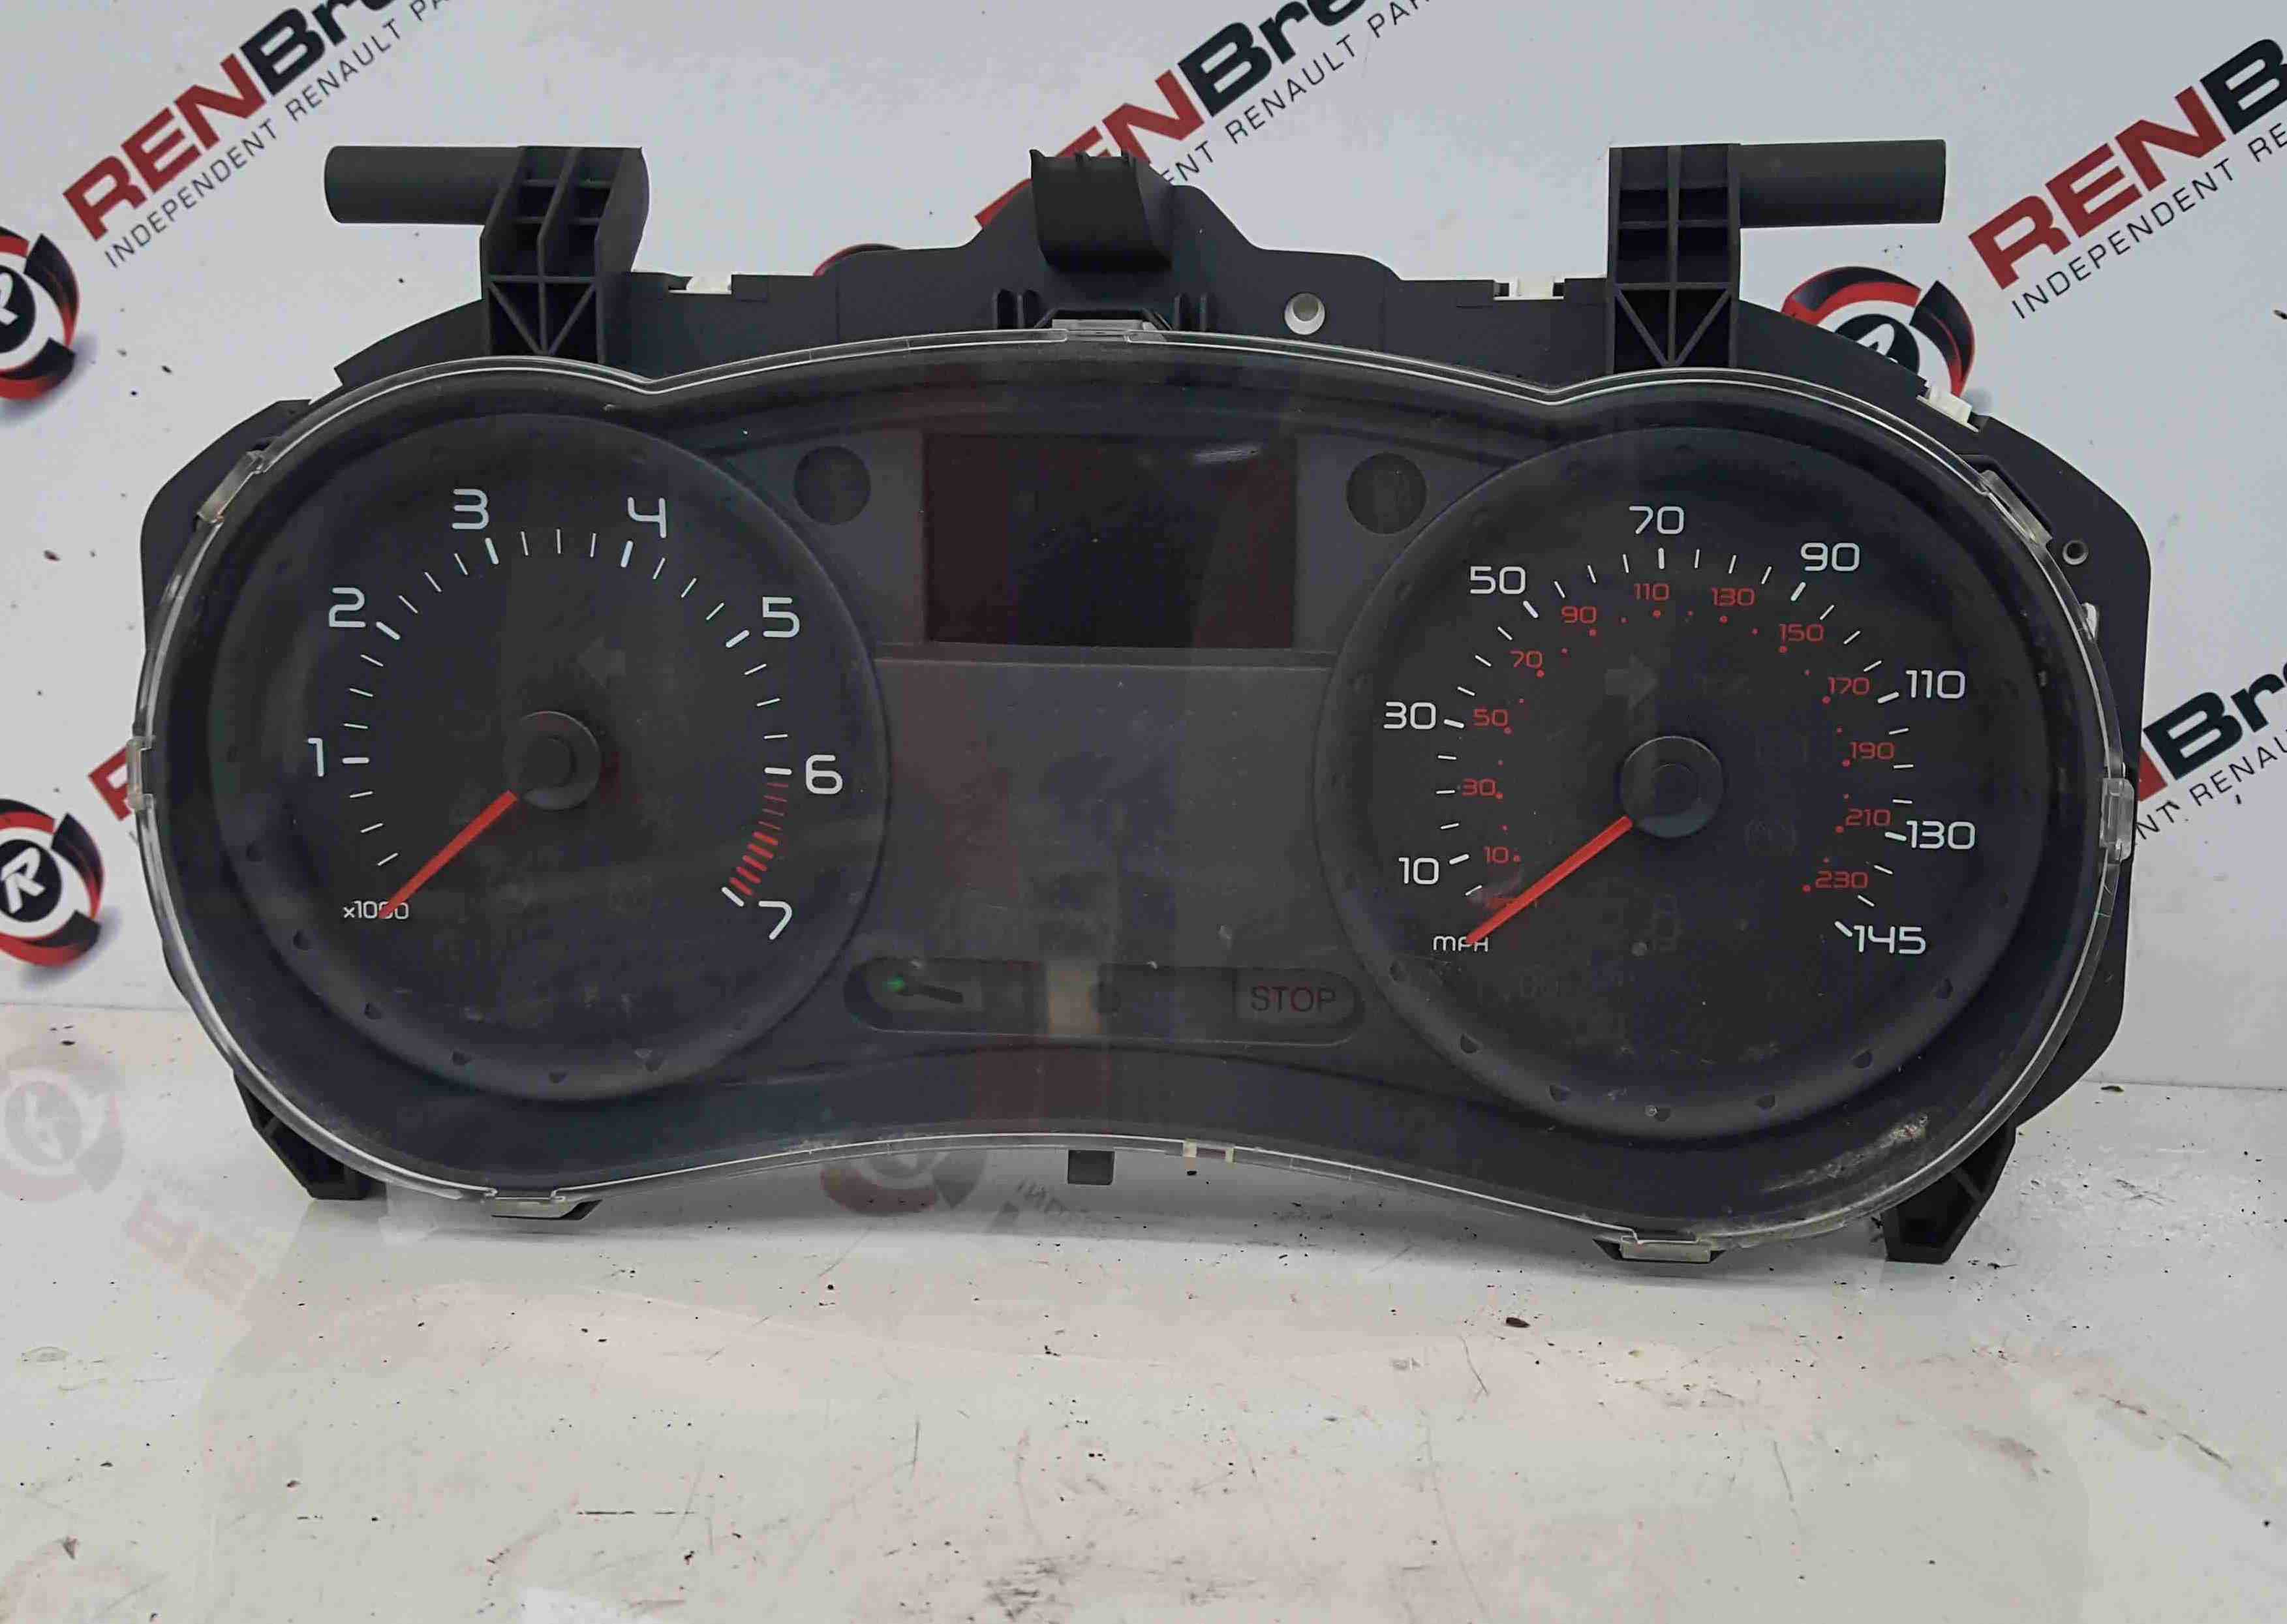 Renault Clio MK3 2005-2012 Instrument Panel Dials Clocks 137K 8200316825